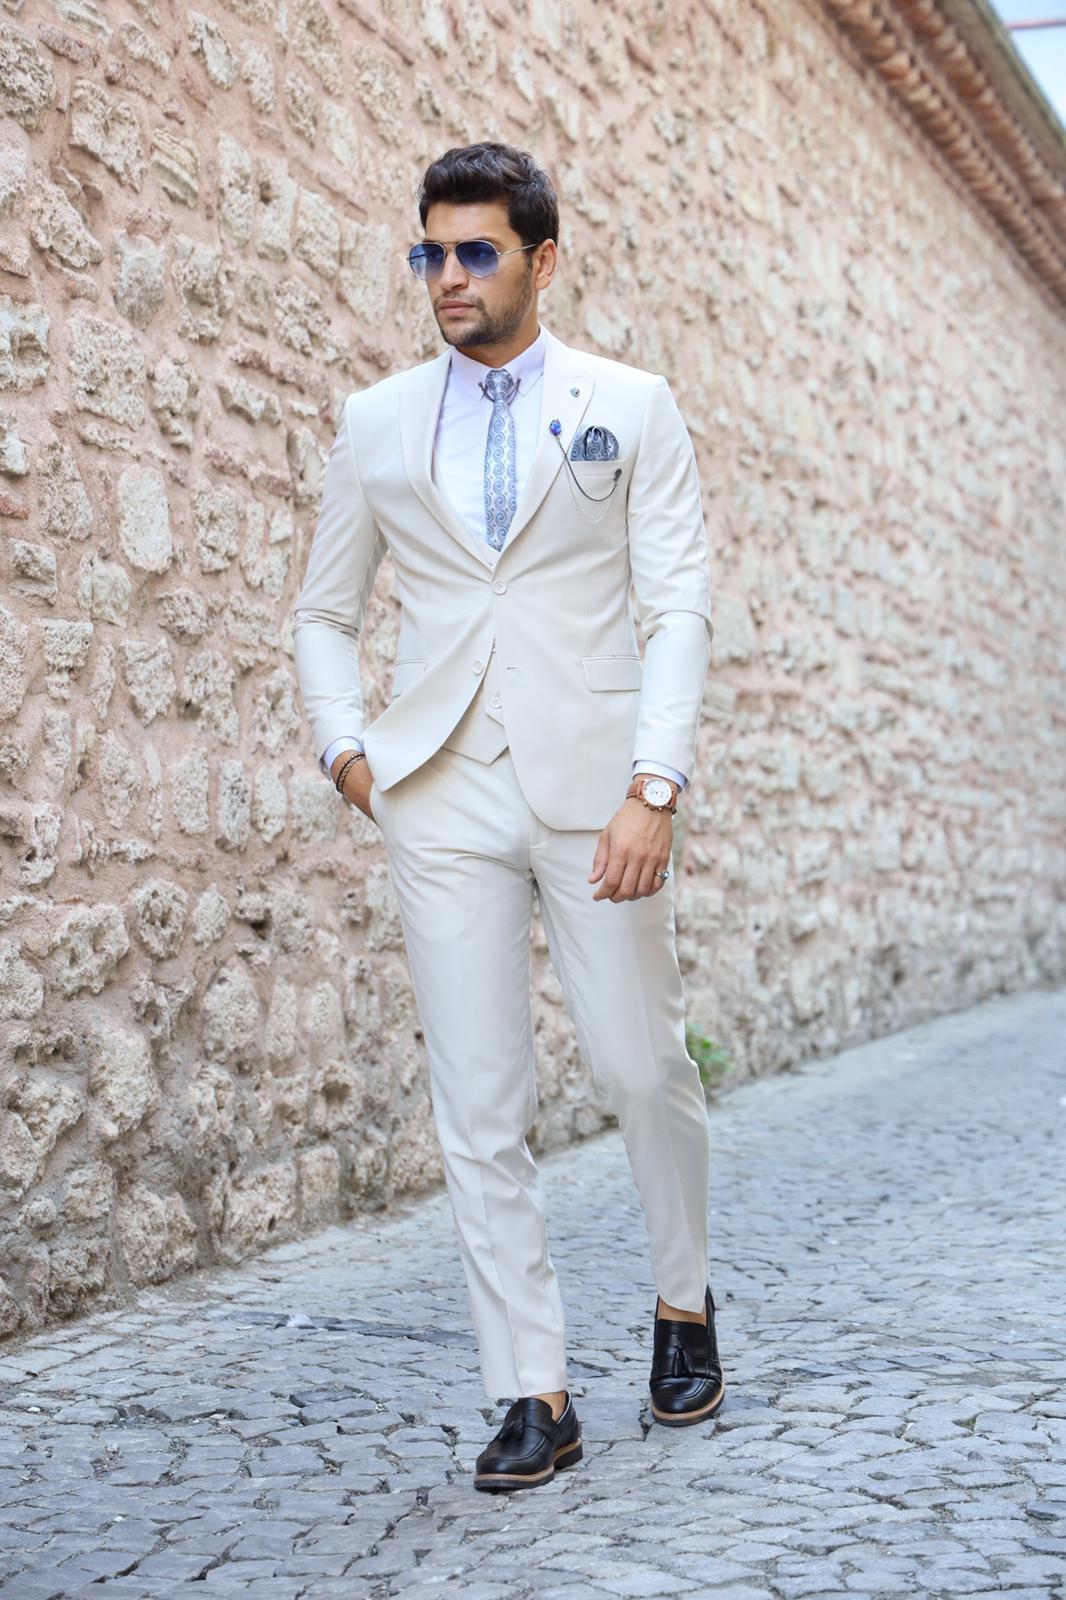 PAREZ Krem Slim Fit Erkek Takım Elbise